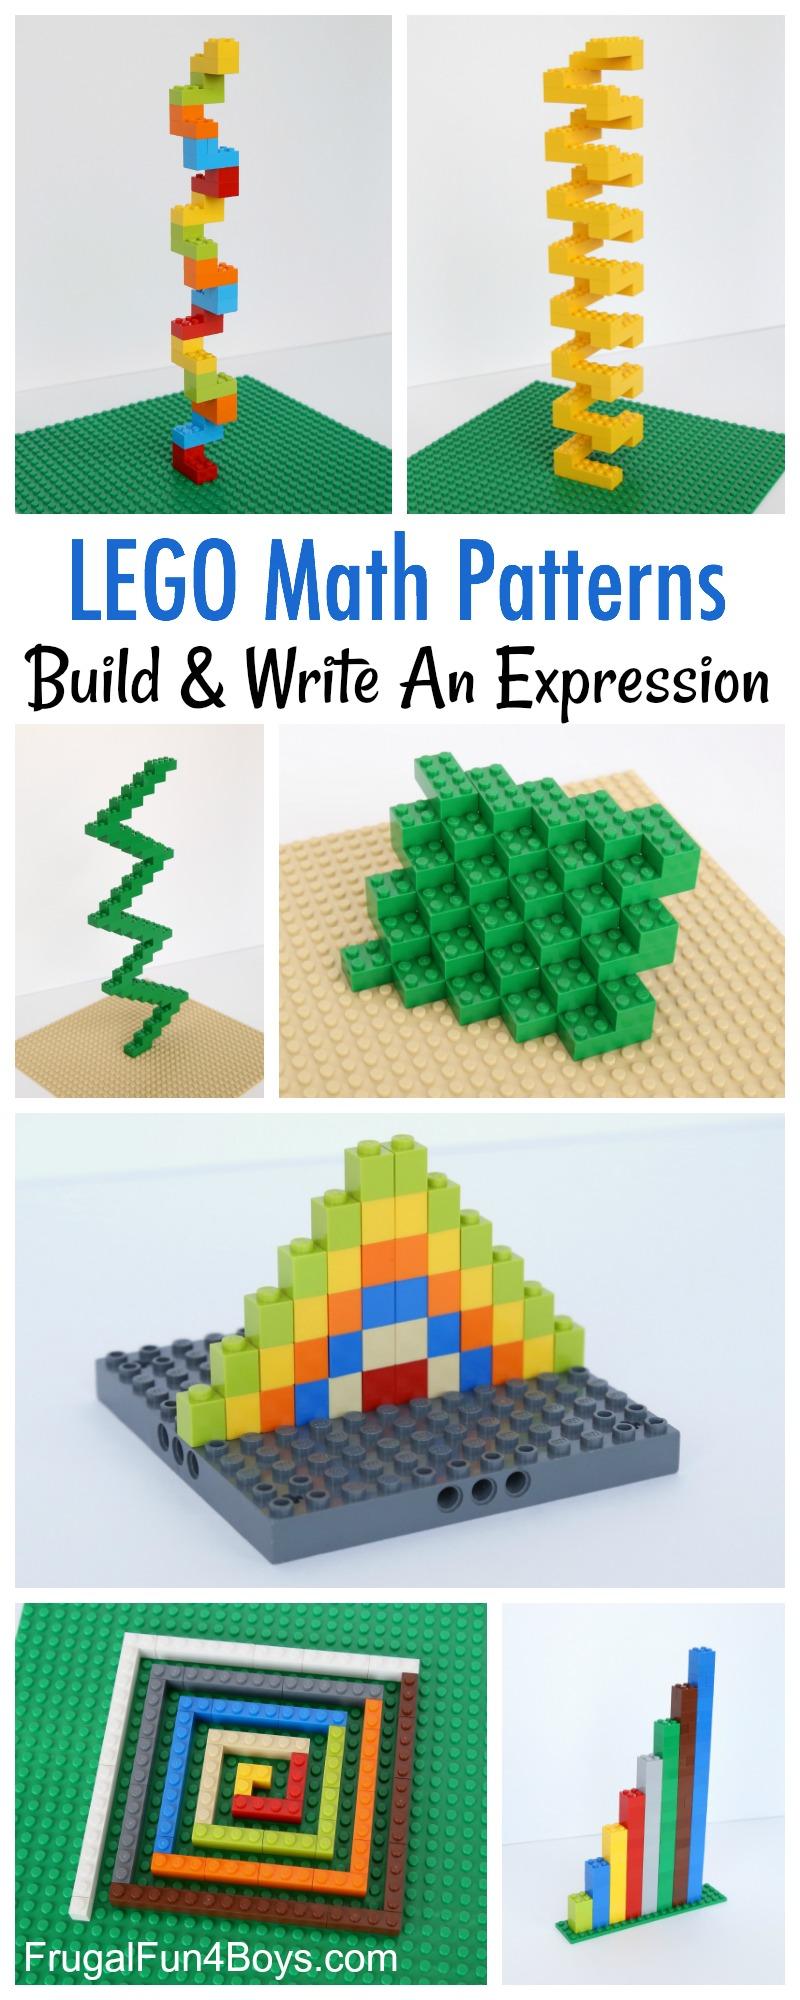 Build Math Patterns with LEGO Bricks